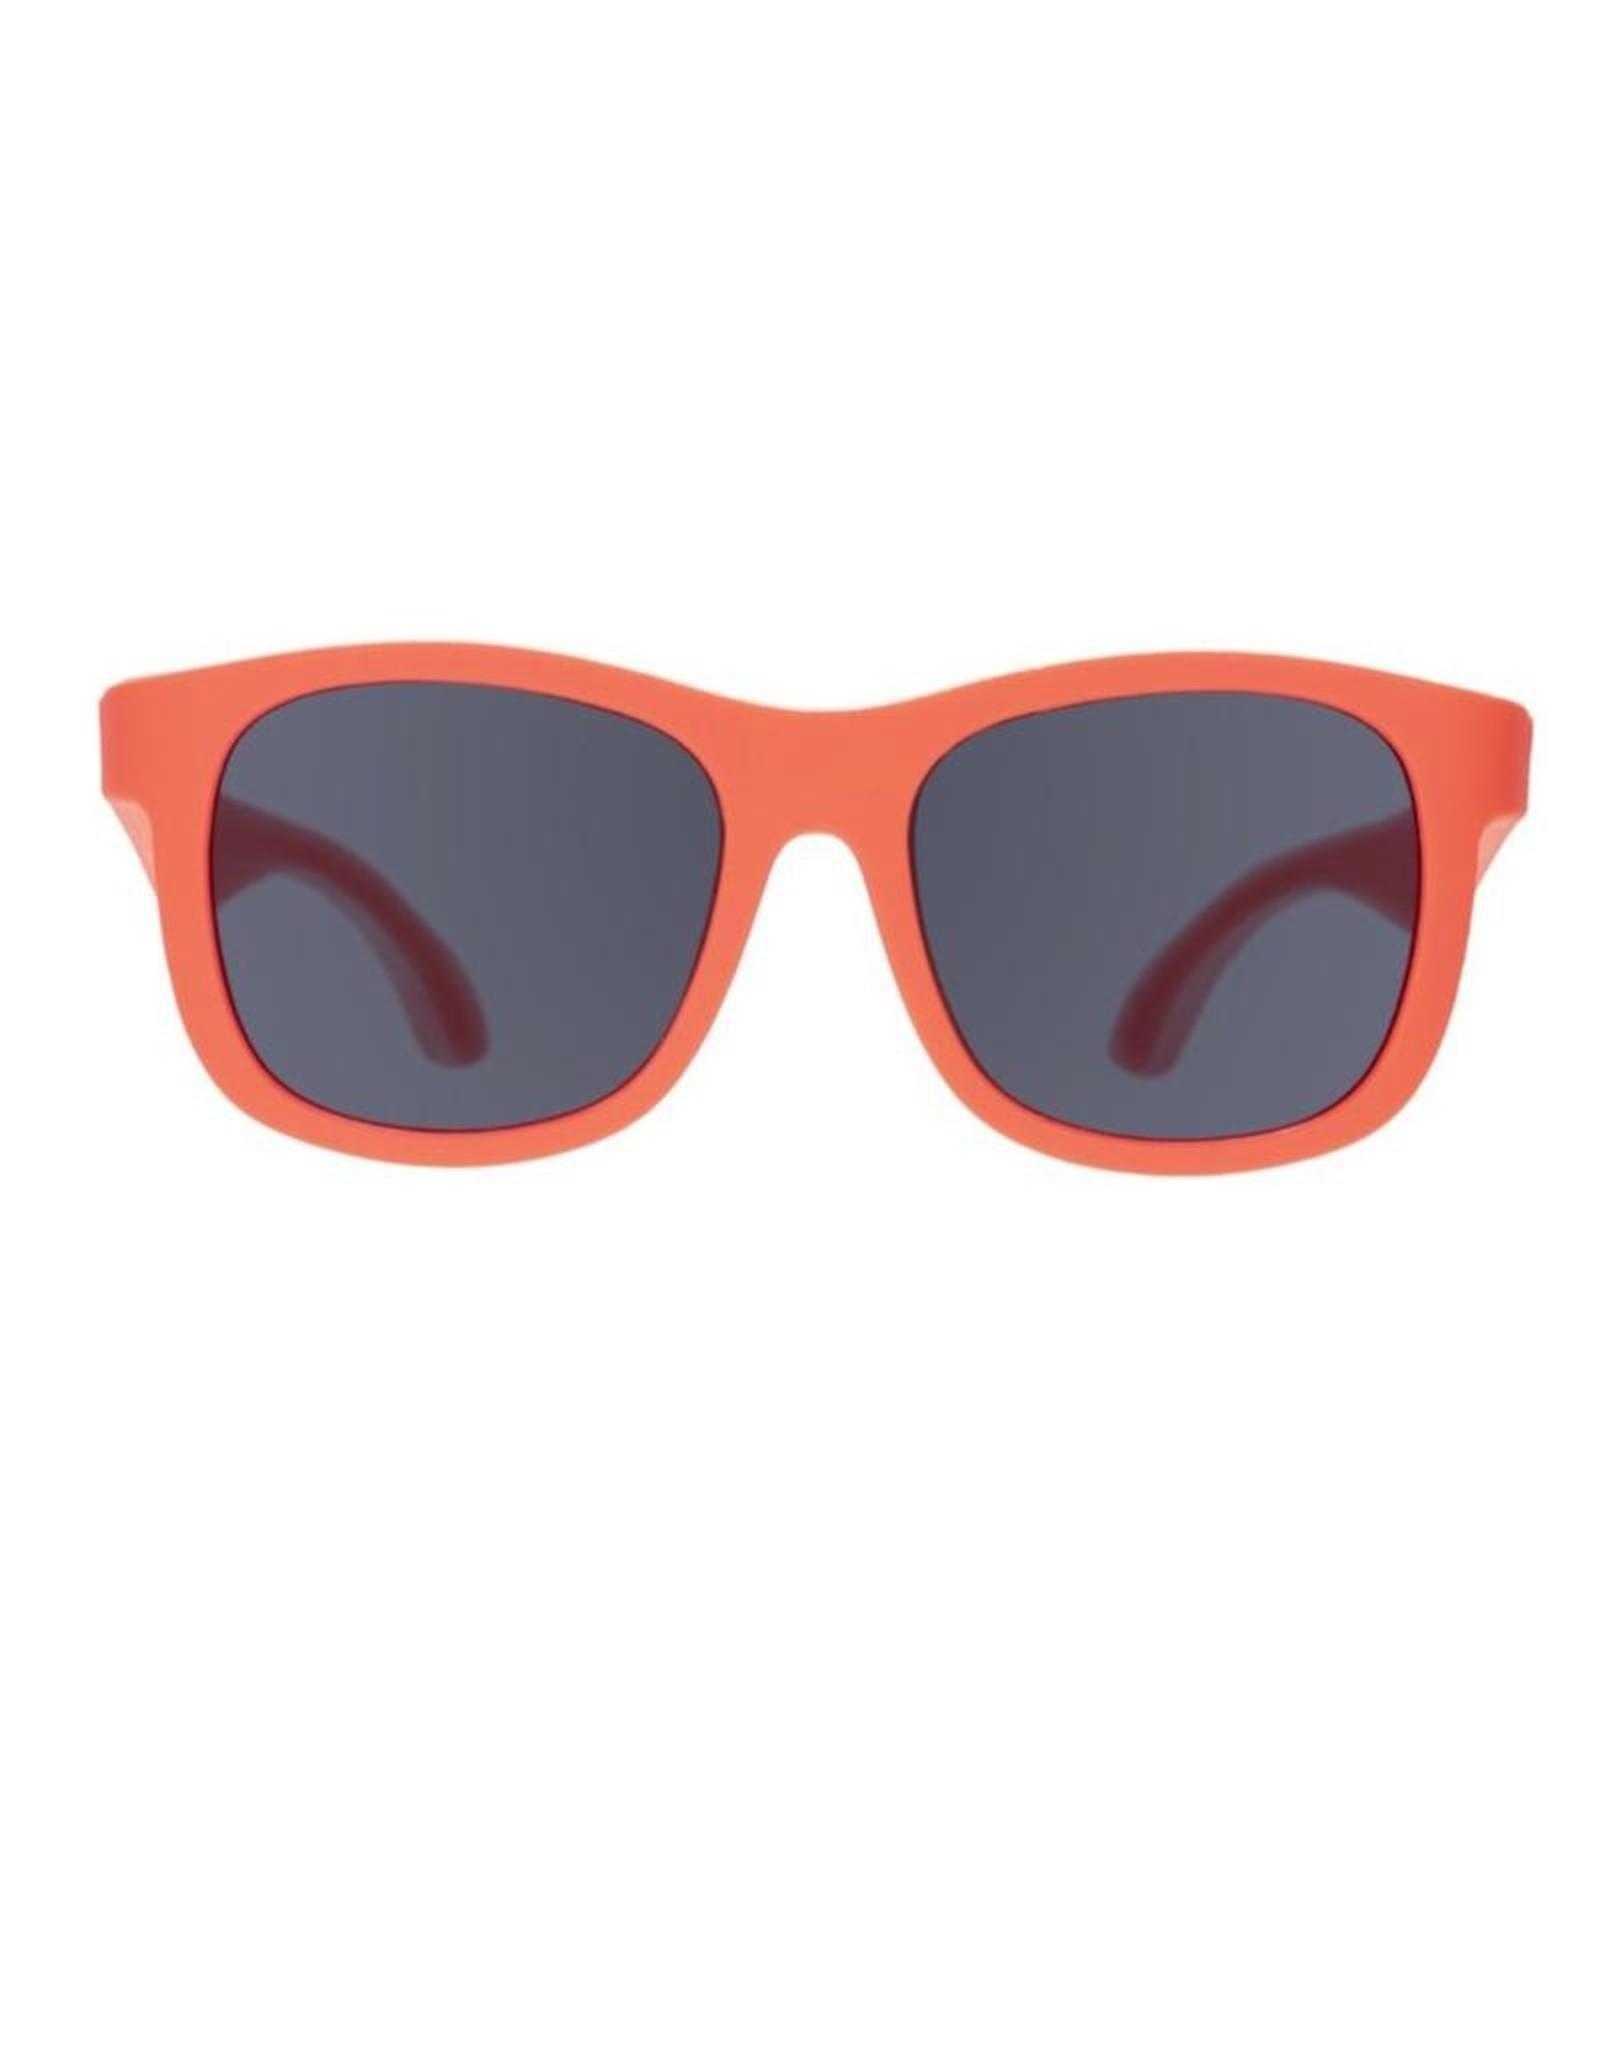 Babiators Original Navigator Wacky Watermelon Sunglasses